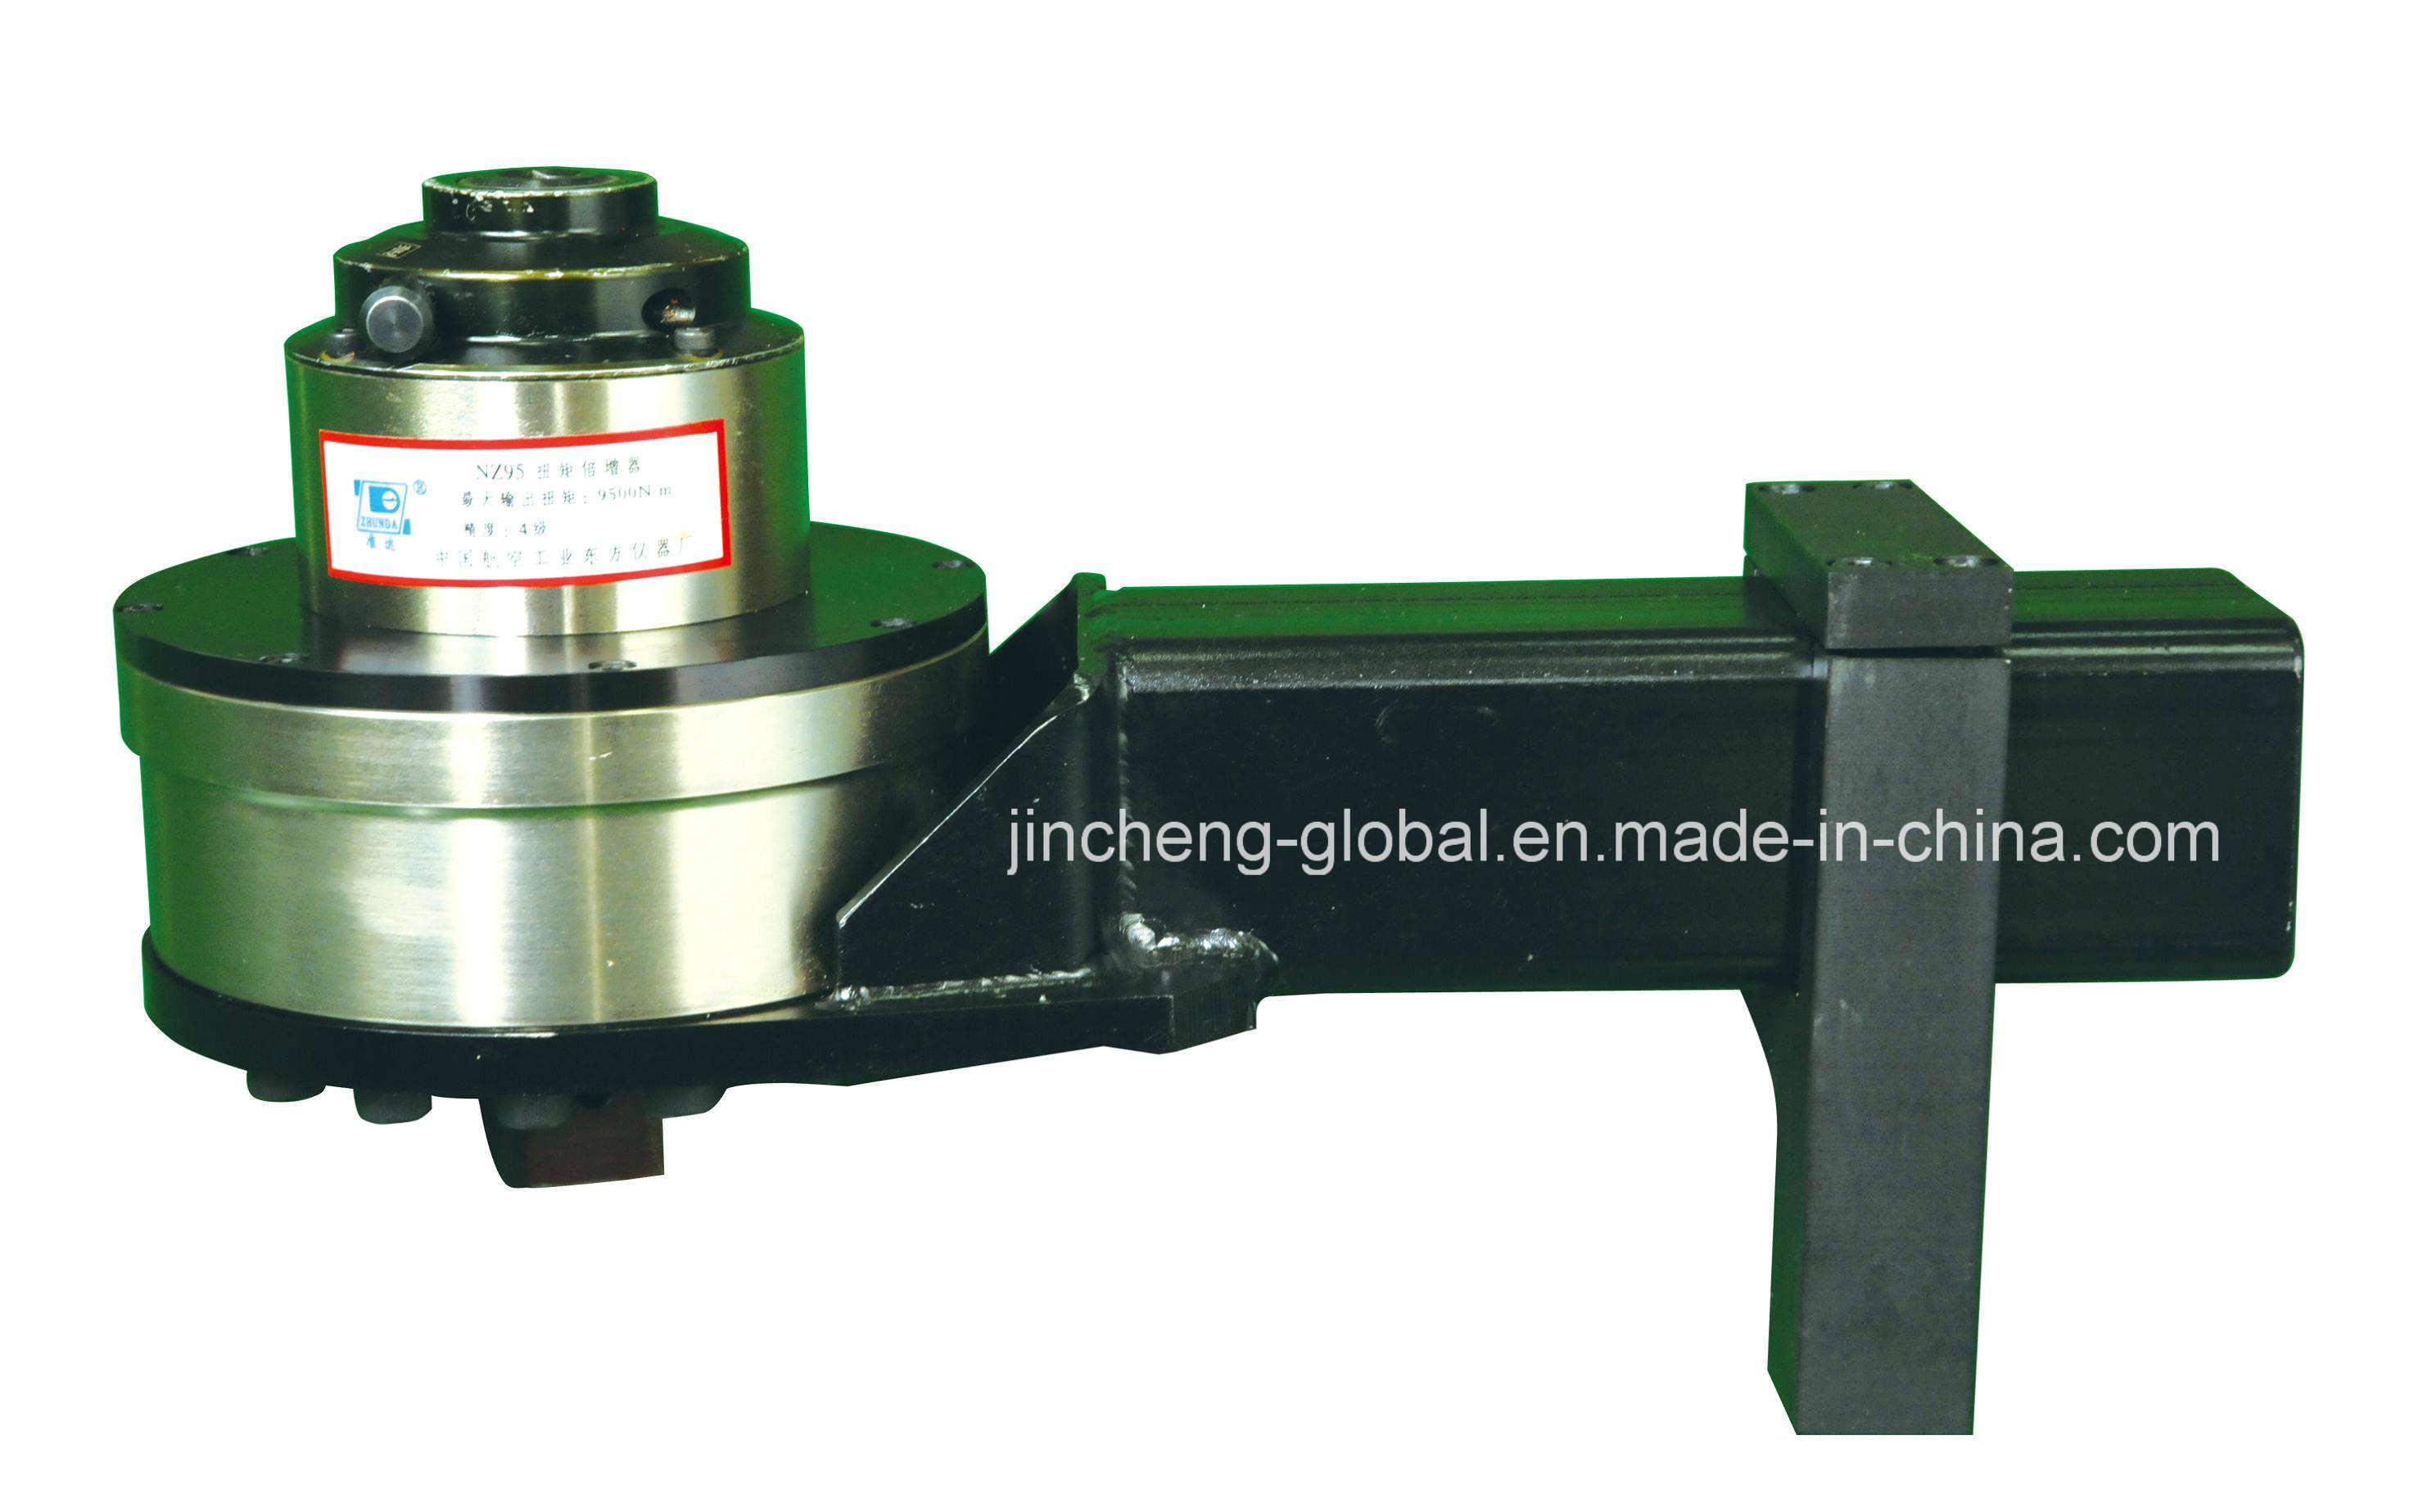 Stainless Steel Torque Multiplier Hand Tool